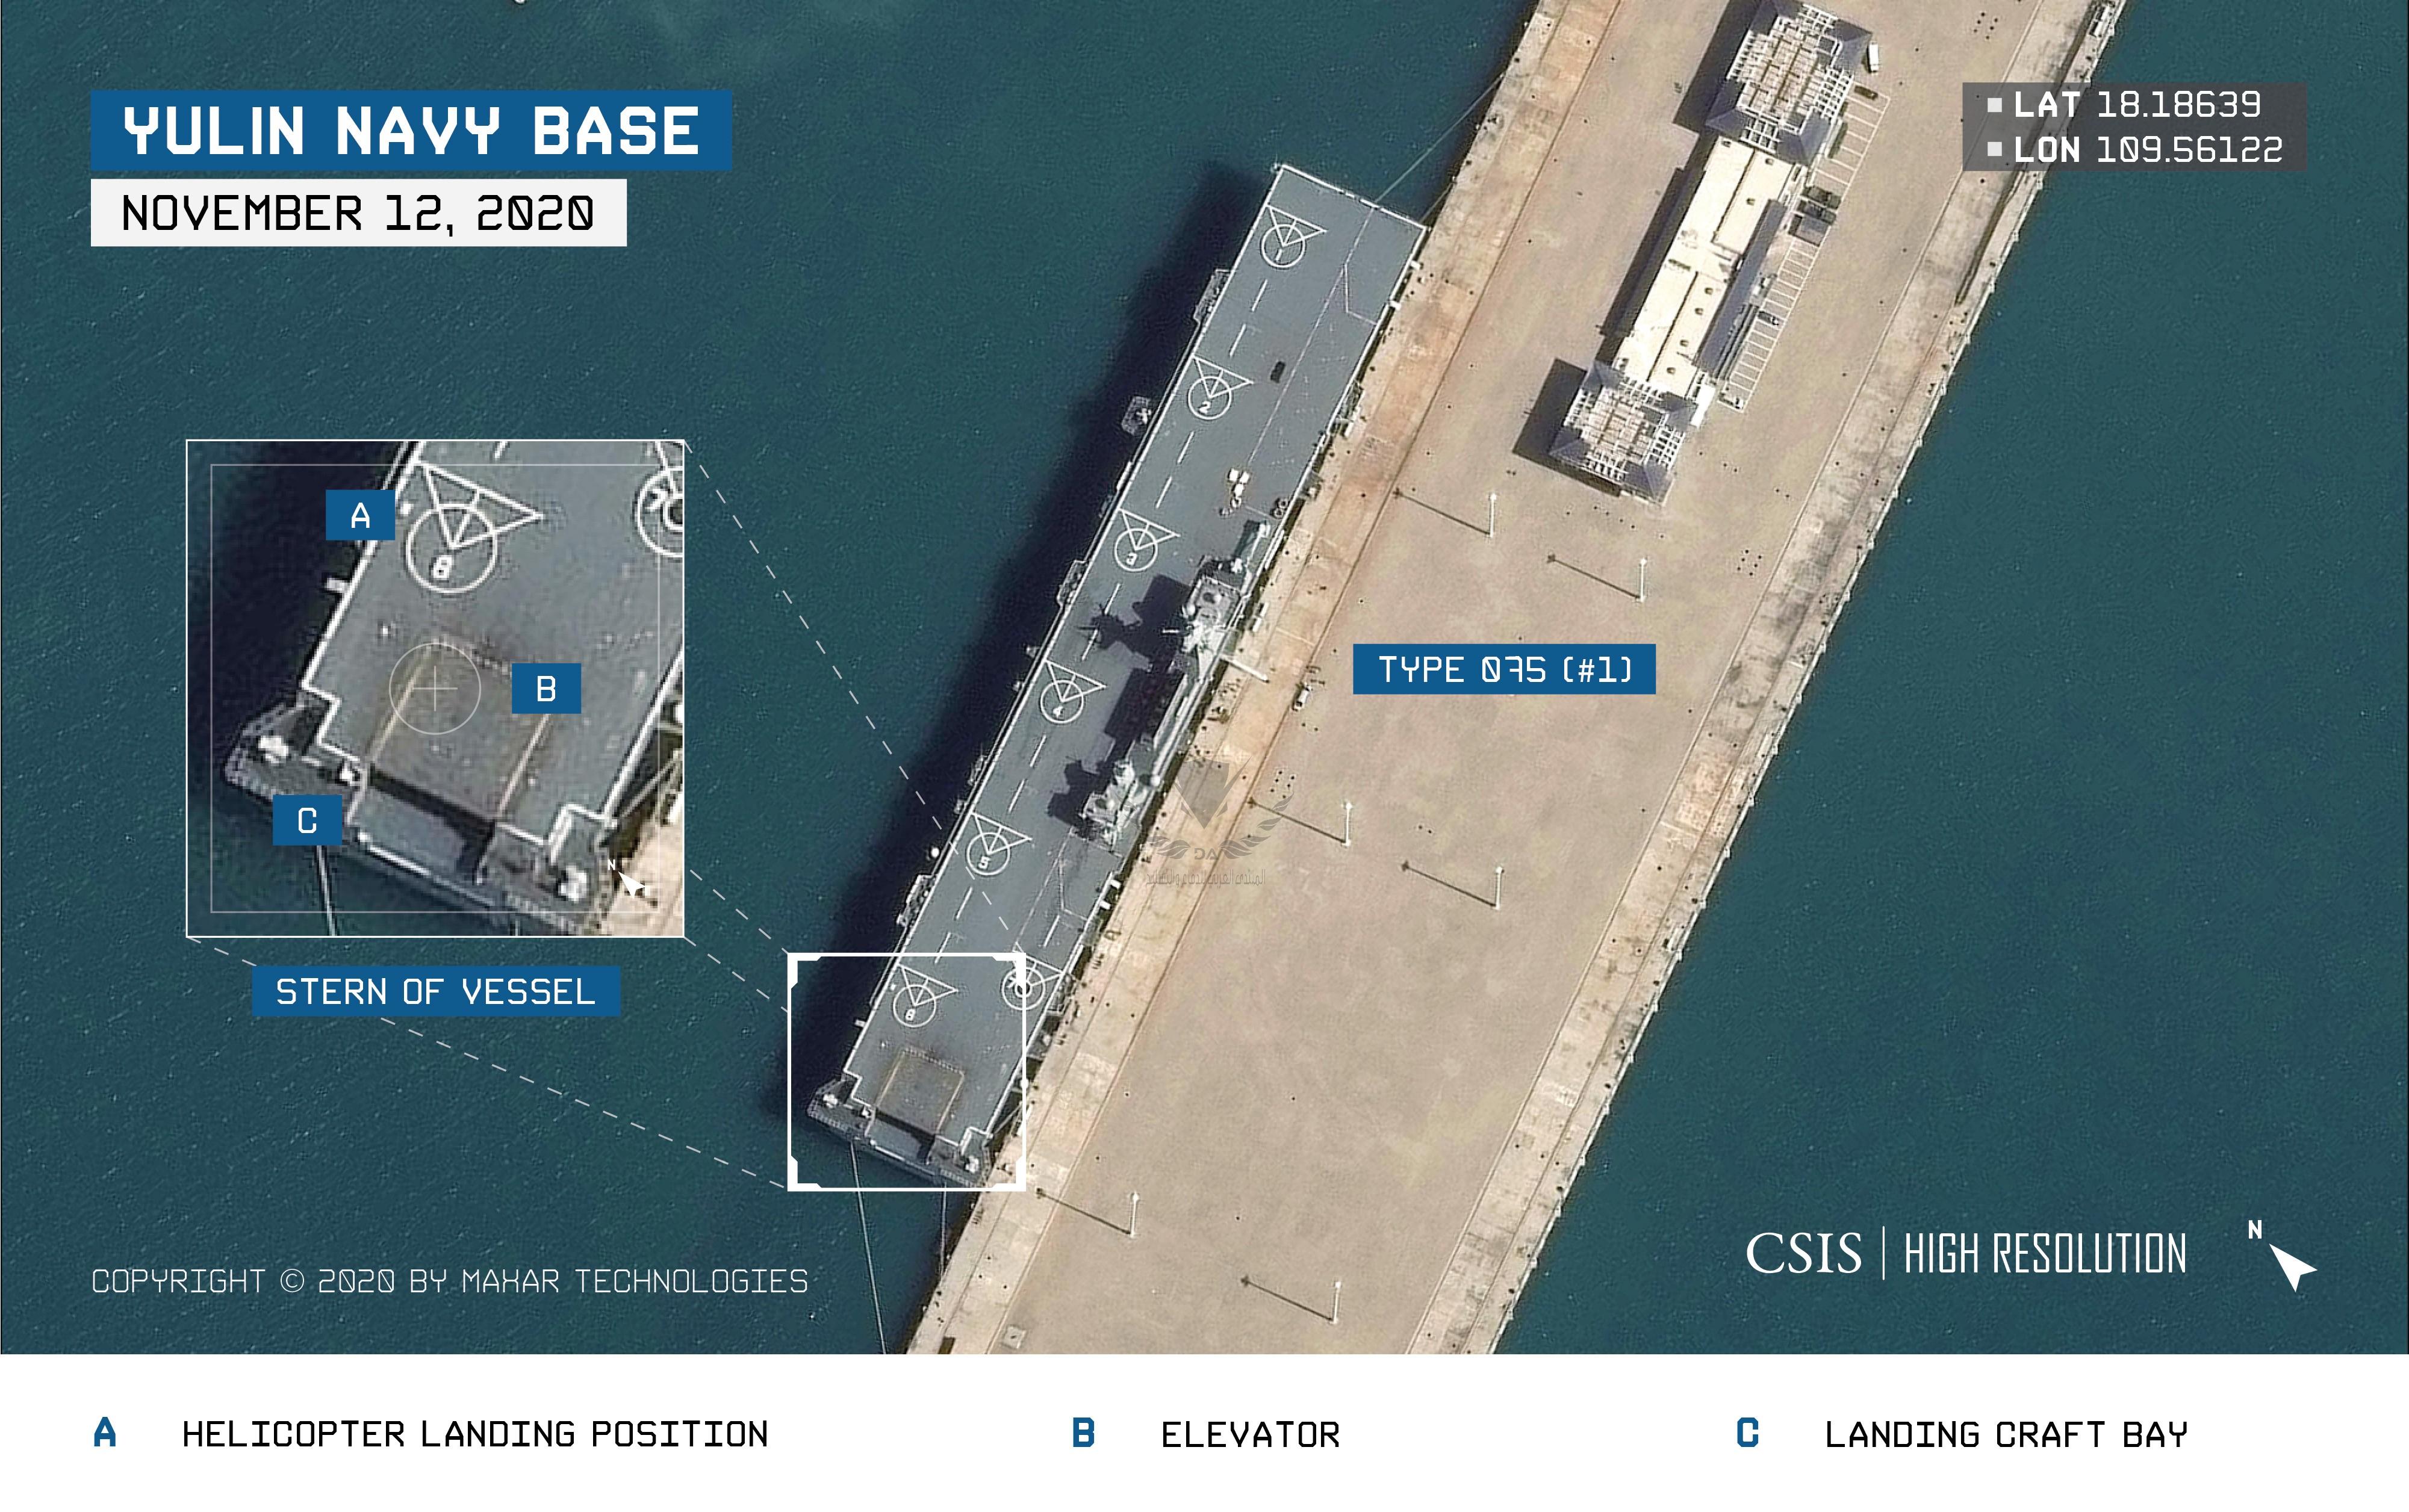 HighResSpotlight_Type095_Yulin_Navy_Base.jpg